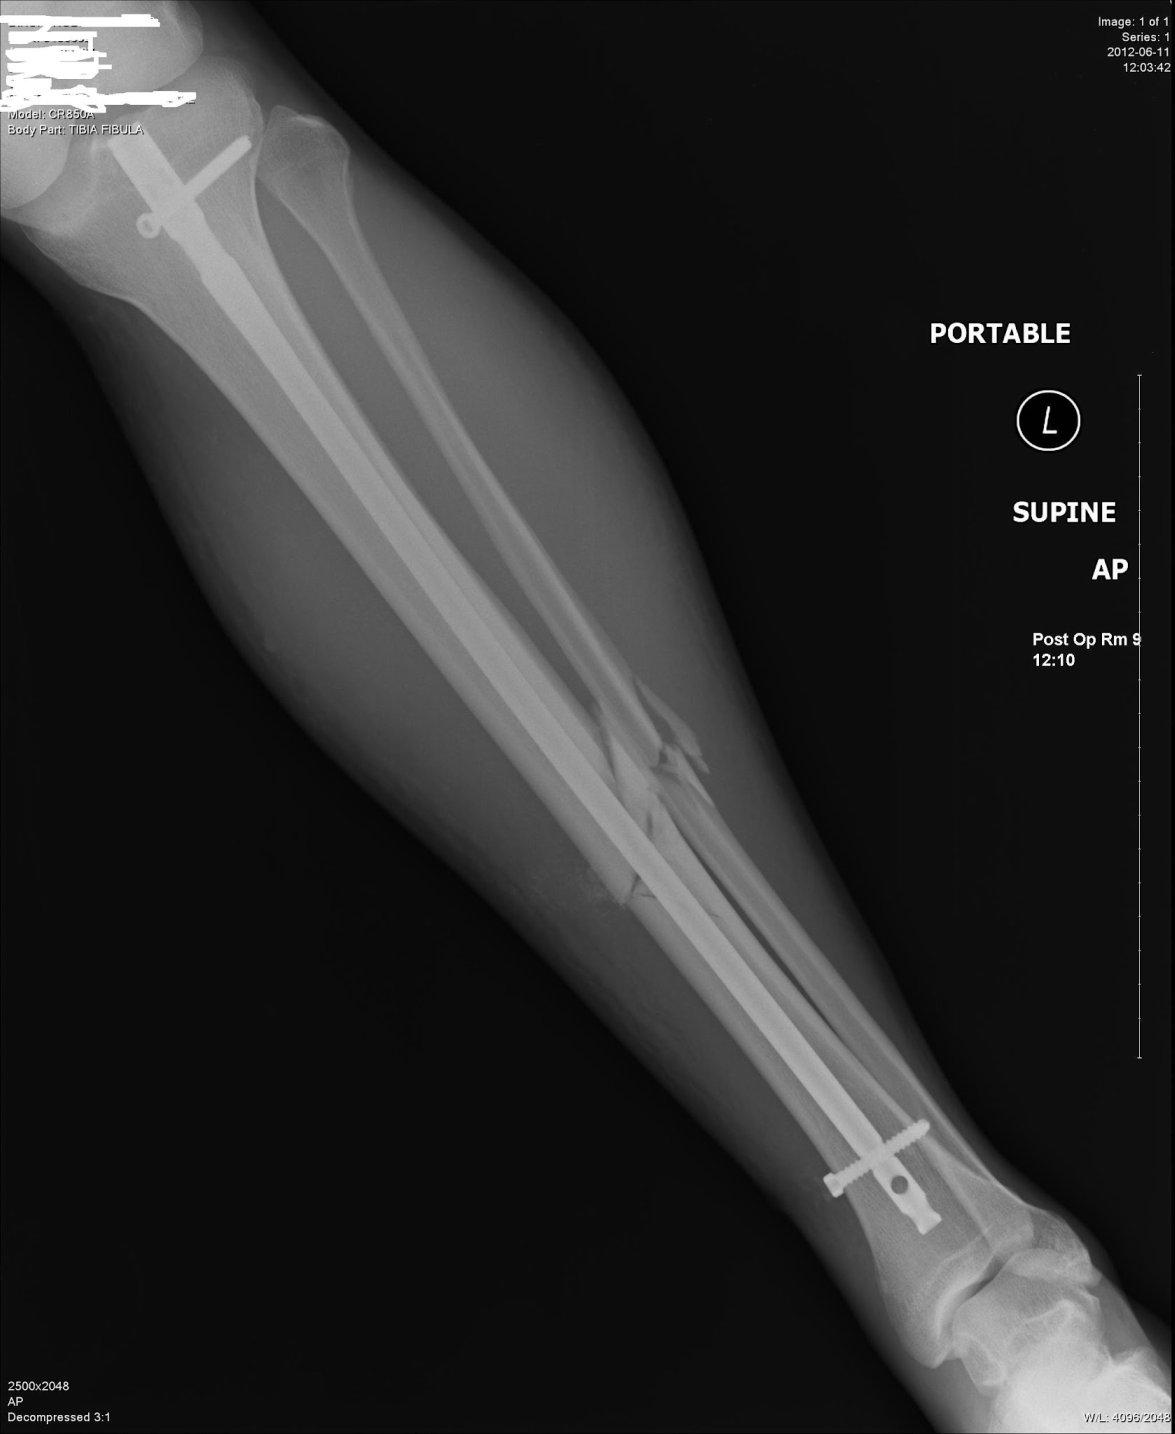 Fractured Tibia and Fibula (Broken Lower Leg Bones) with ...